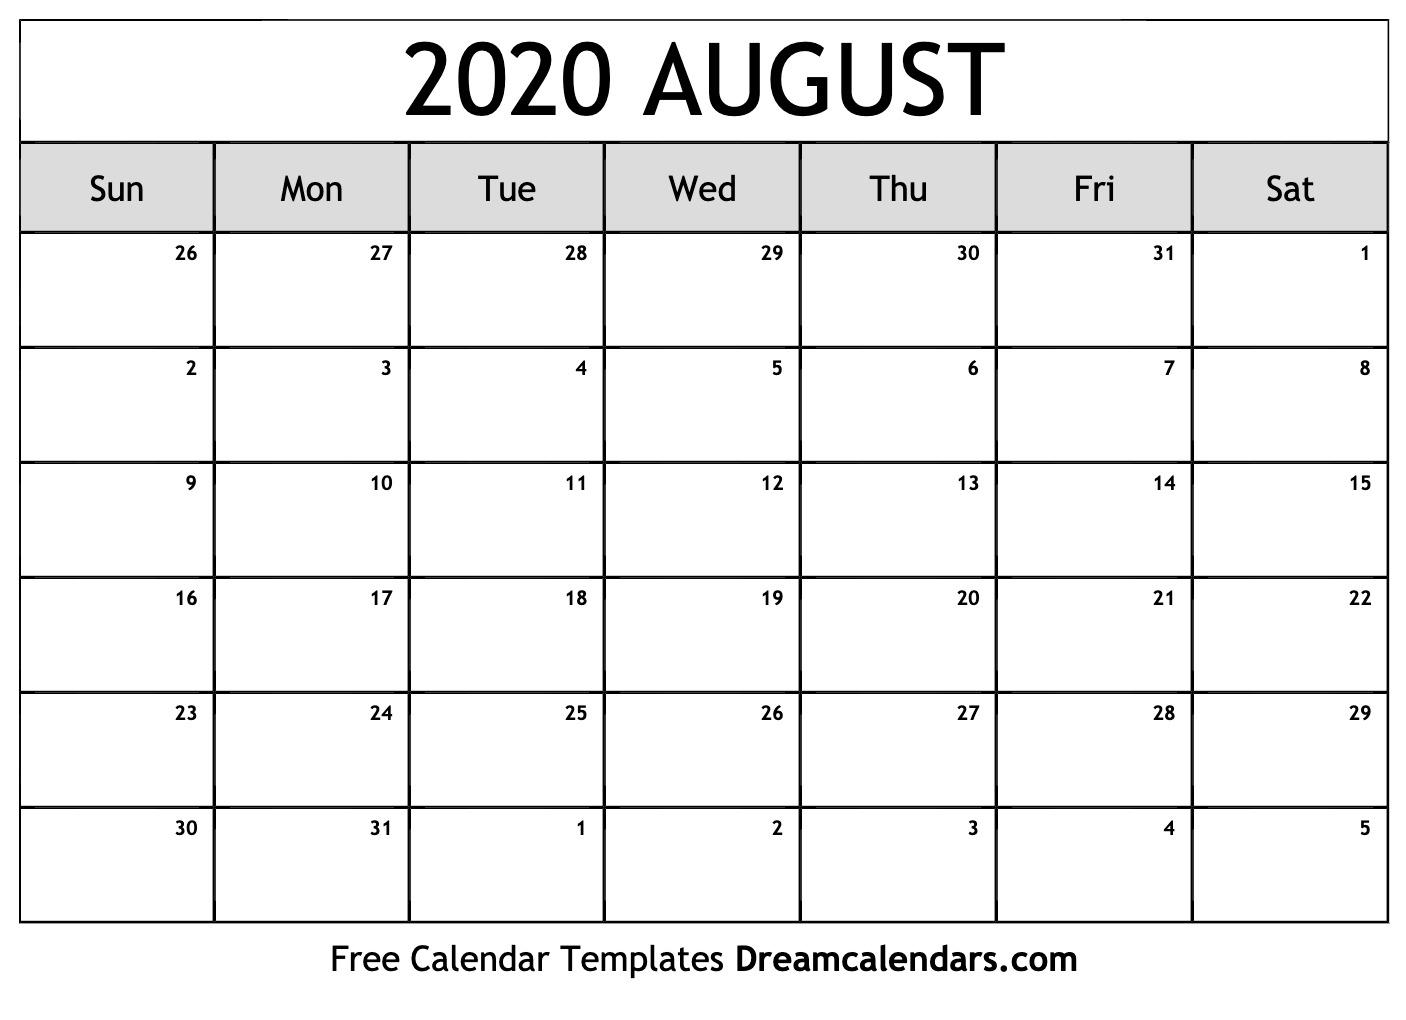 Free Blank August 2020 Printable Calendar within Kalendar Kuda July 2020